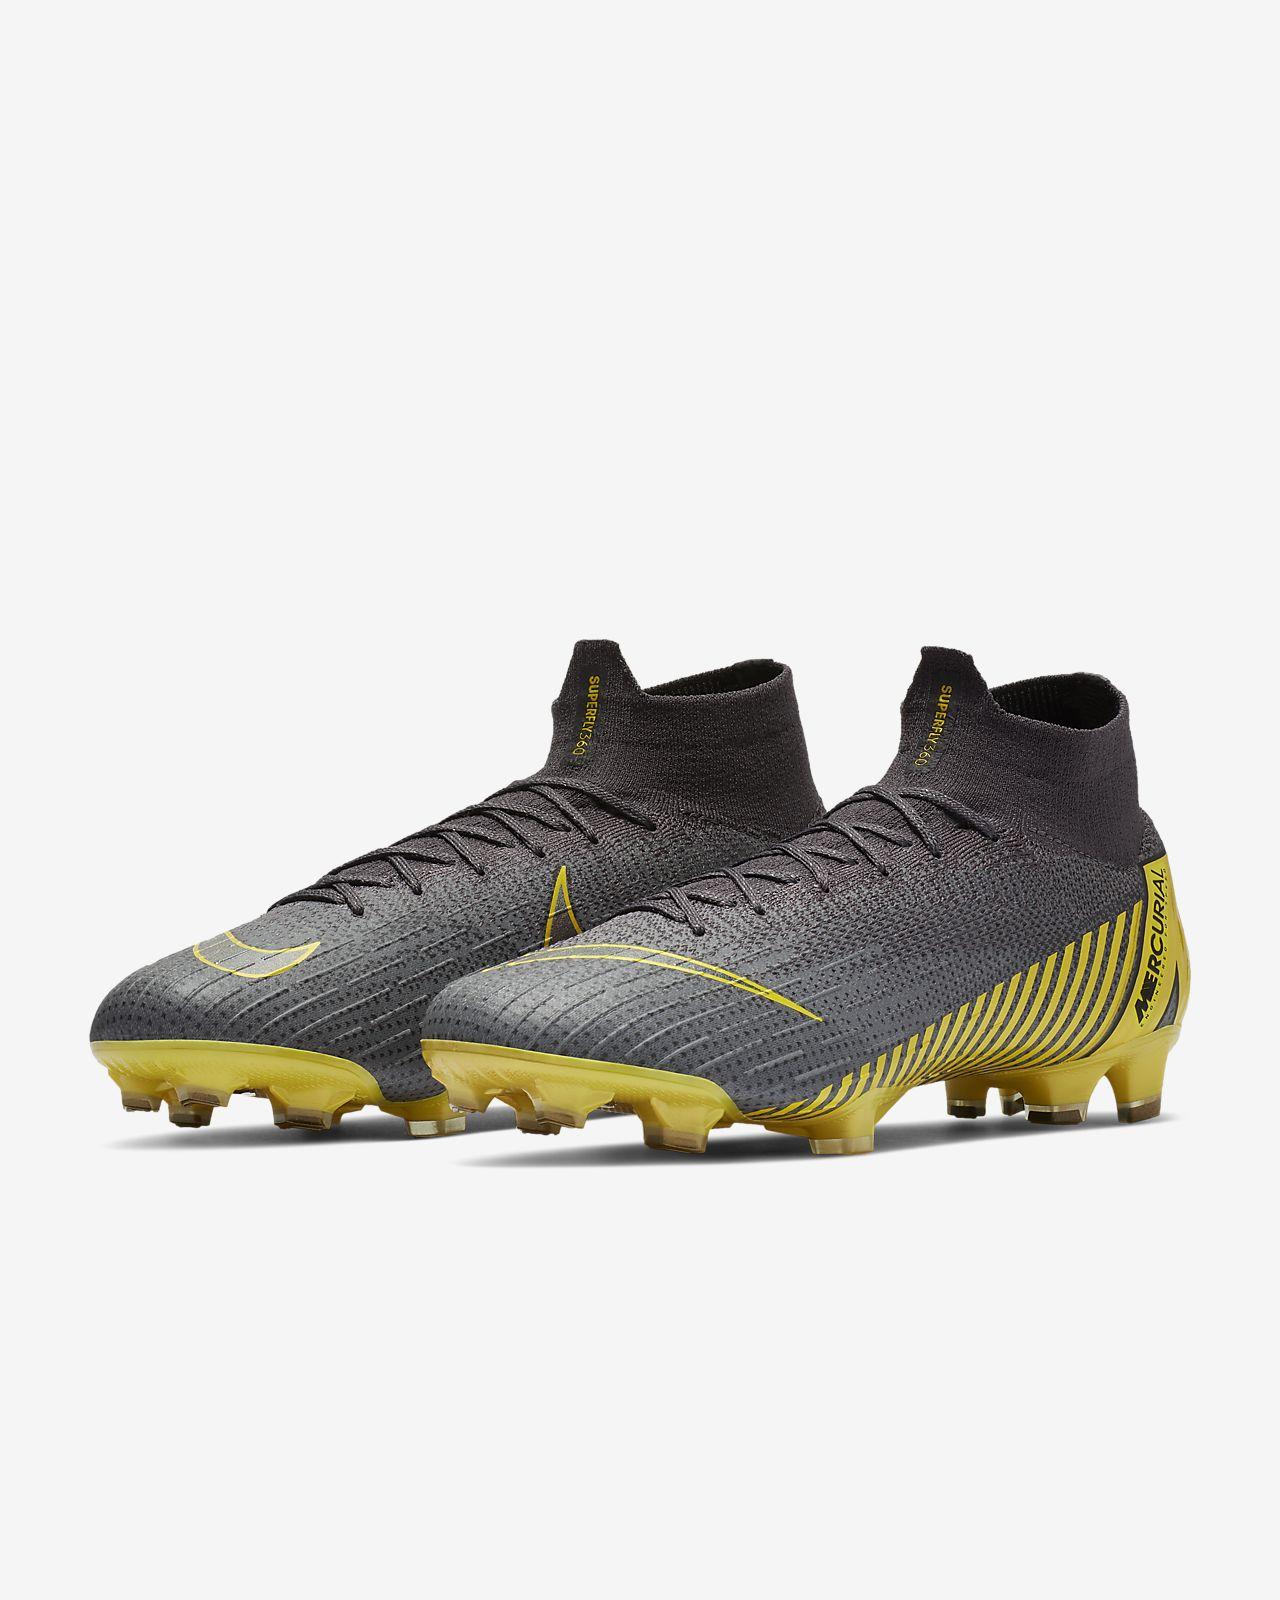 6ccff3cc88 ... Chaussure de football à crampons pour terrain sec Nike Superfly 6 Elite  FG Game Over